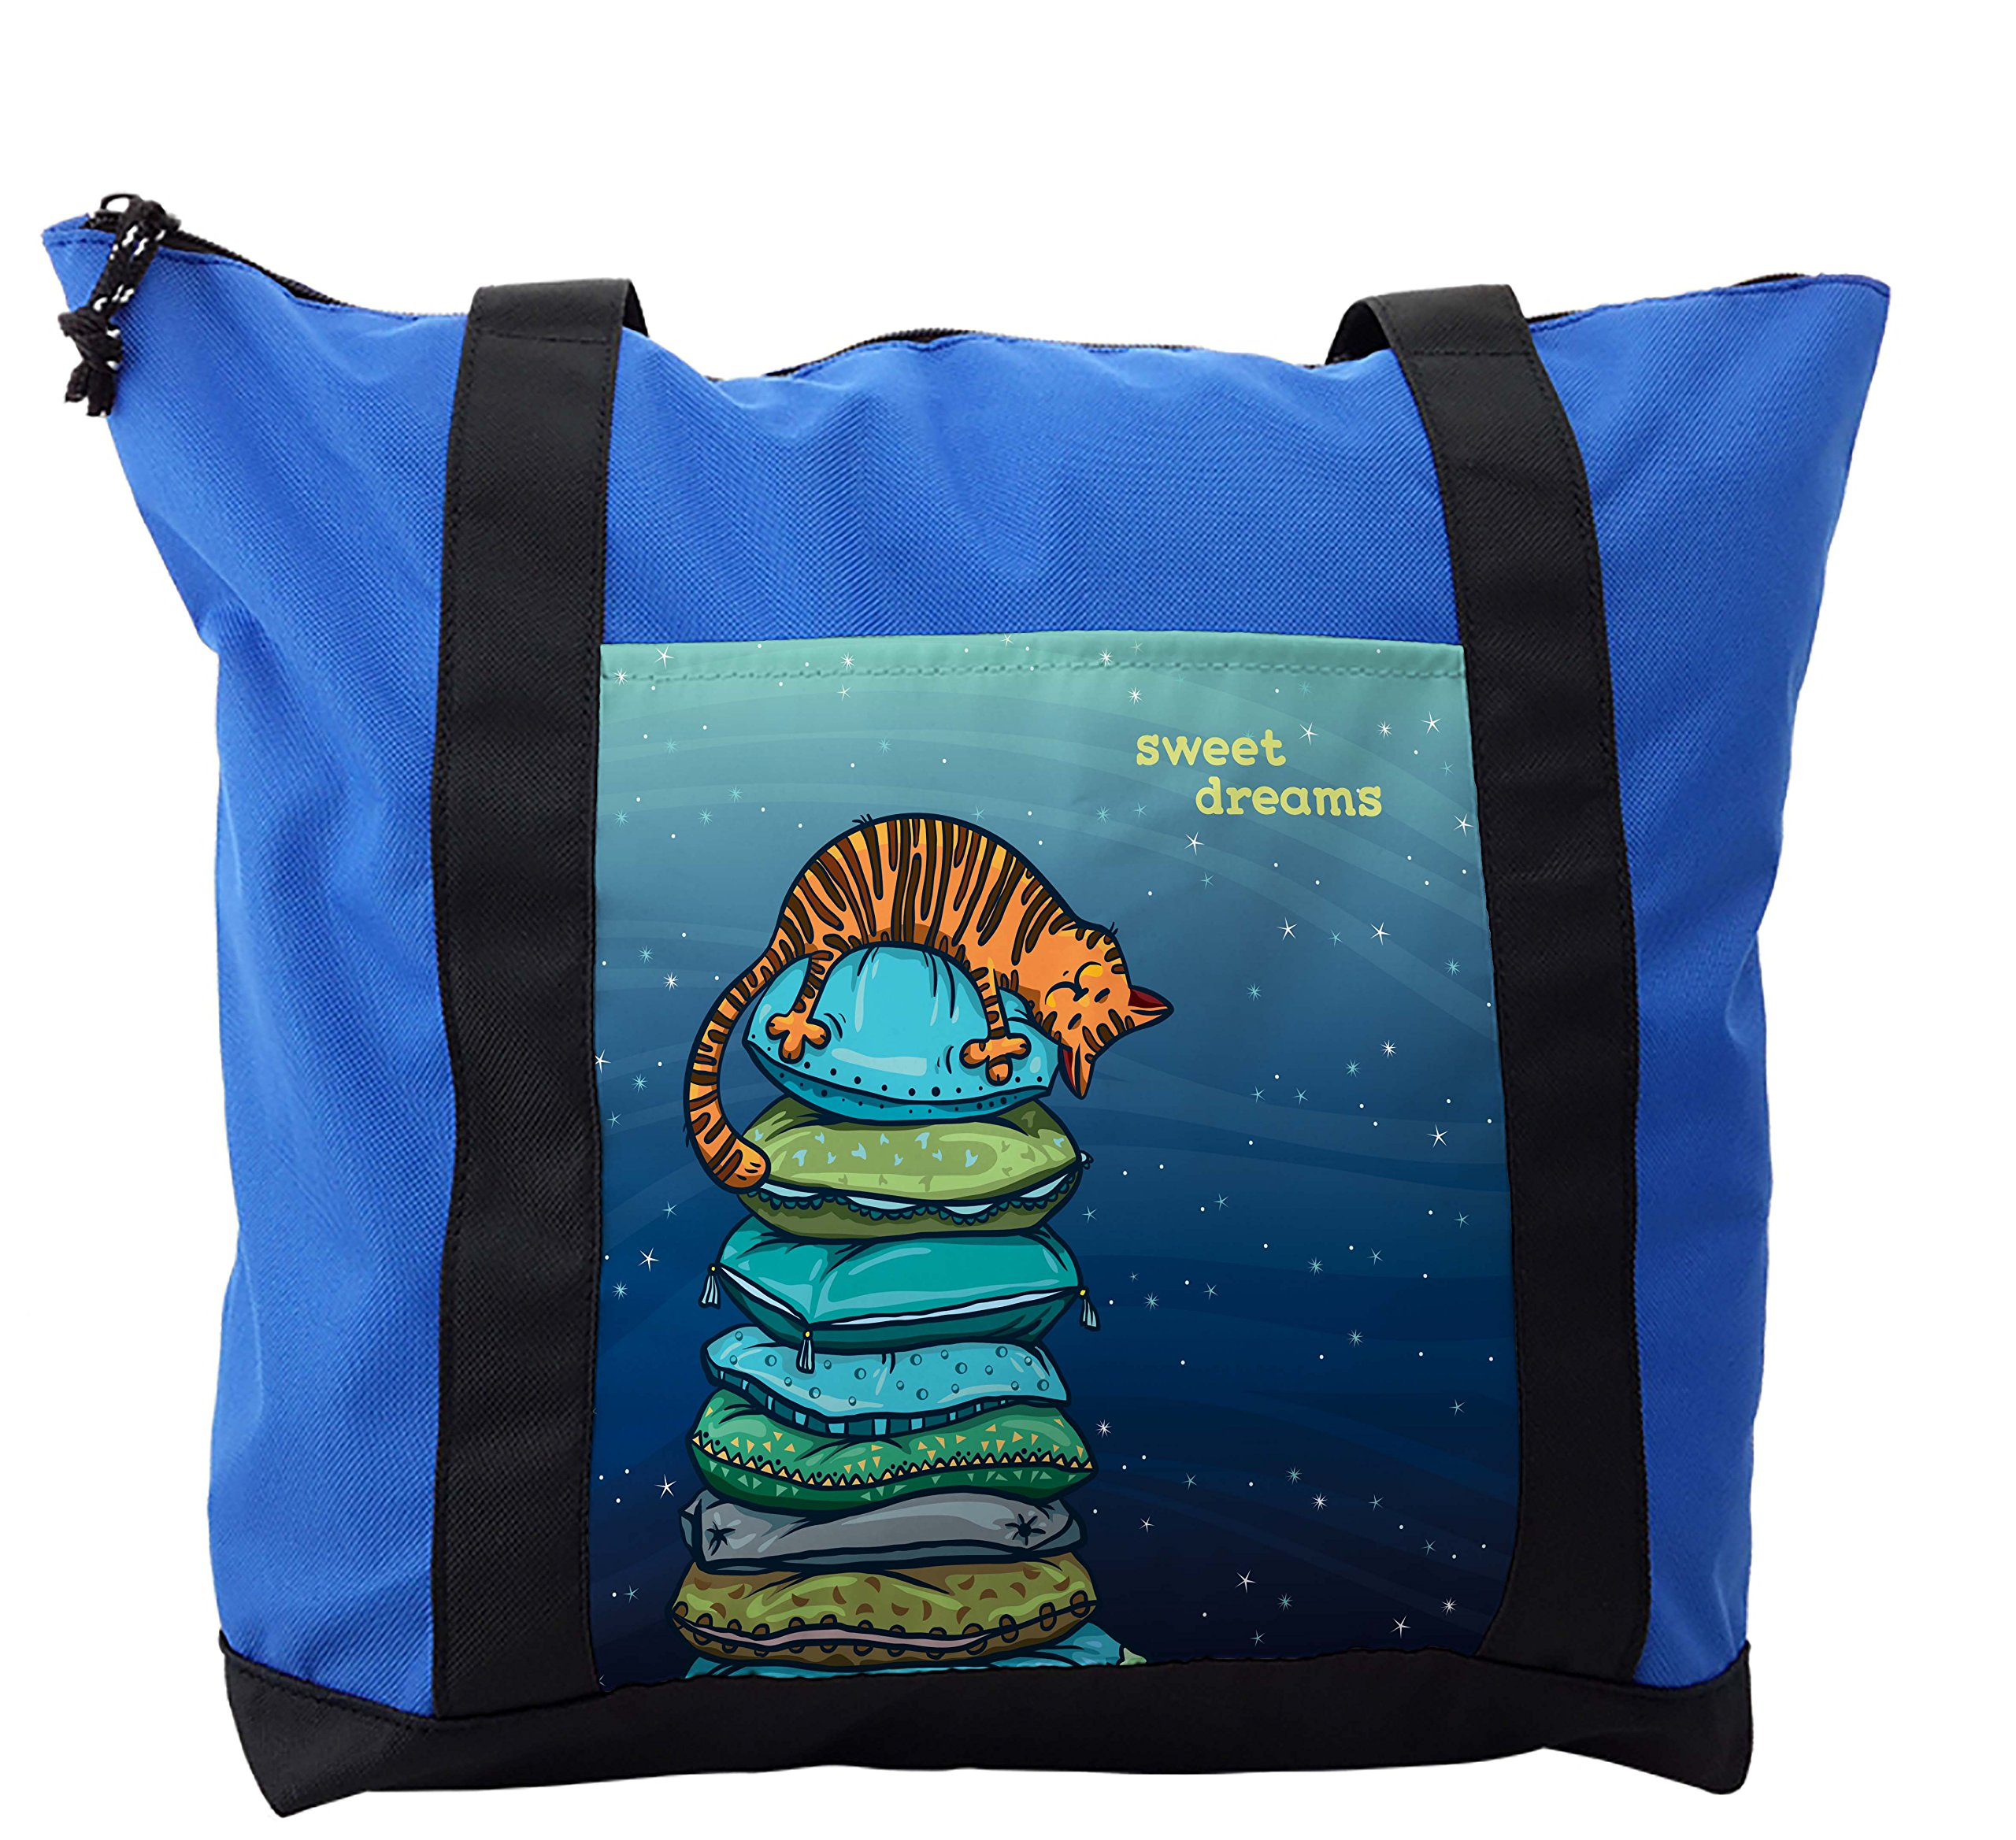 Lunarable Cat Shoulder Bag, Kitten Sleeping on the Pillows, Durable with Zipper